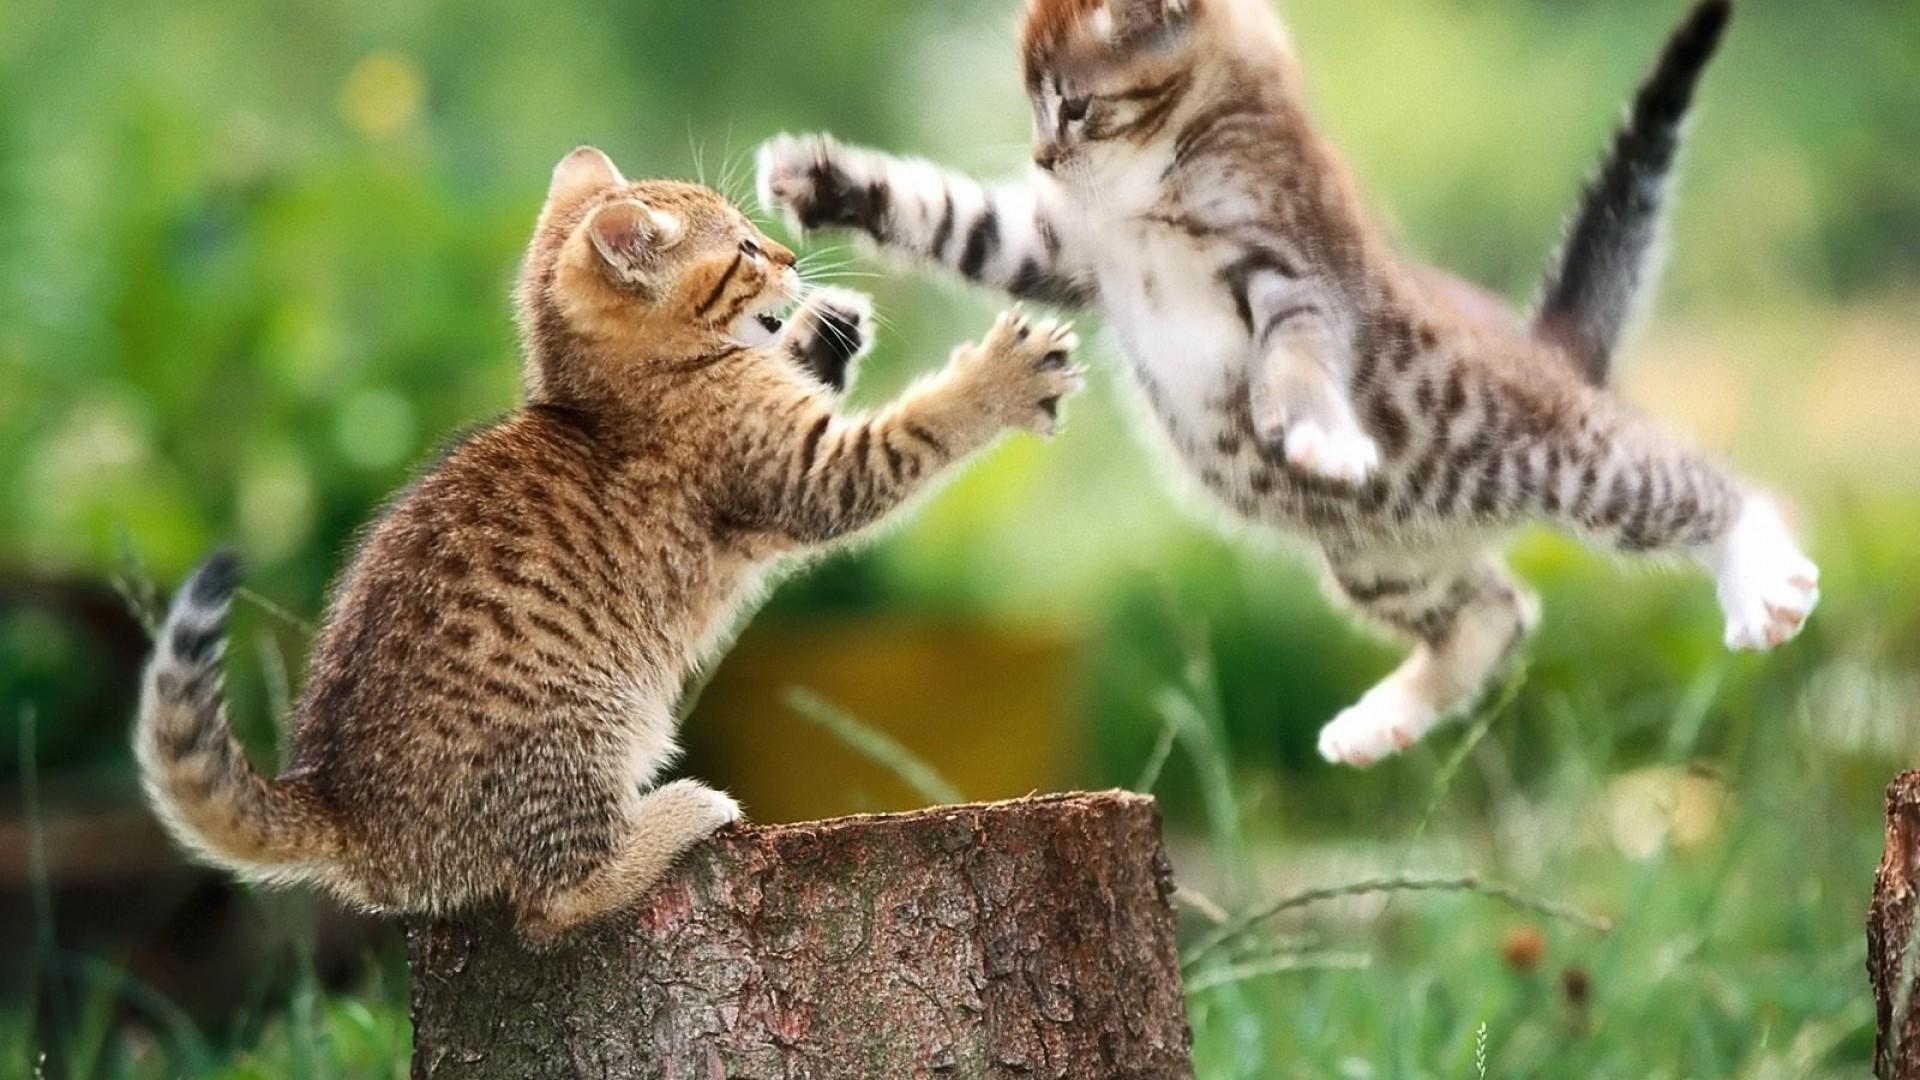 Kitty Play Wallpaper – Wallpapersafari intended for Kitty Play Wallpapers